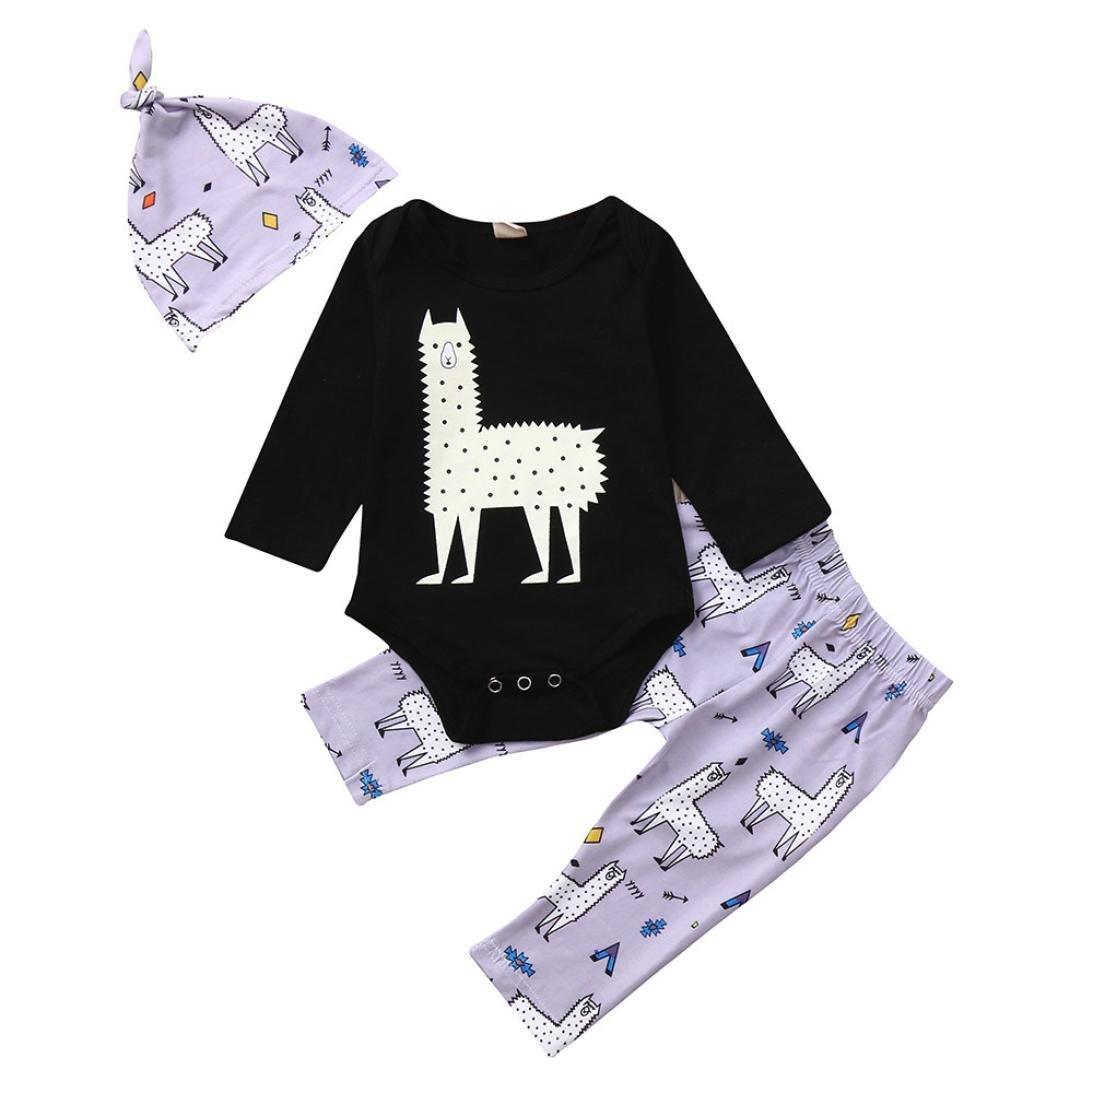 Jchen(TM) Hot Sales! Newborn Baby Boys Girls Long Sleeve Cartoon Print Tops+ Pants Cap Clothes Sets for 0-24 Months (Age: 18-24 Months)